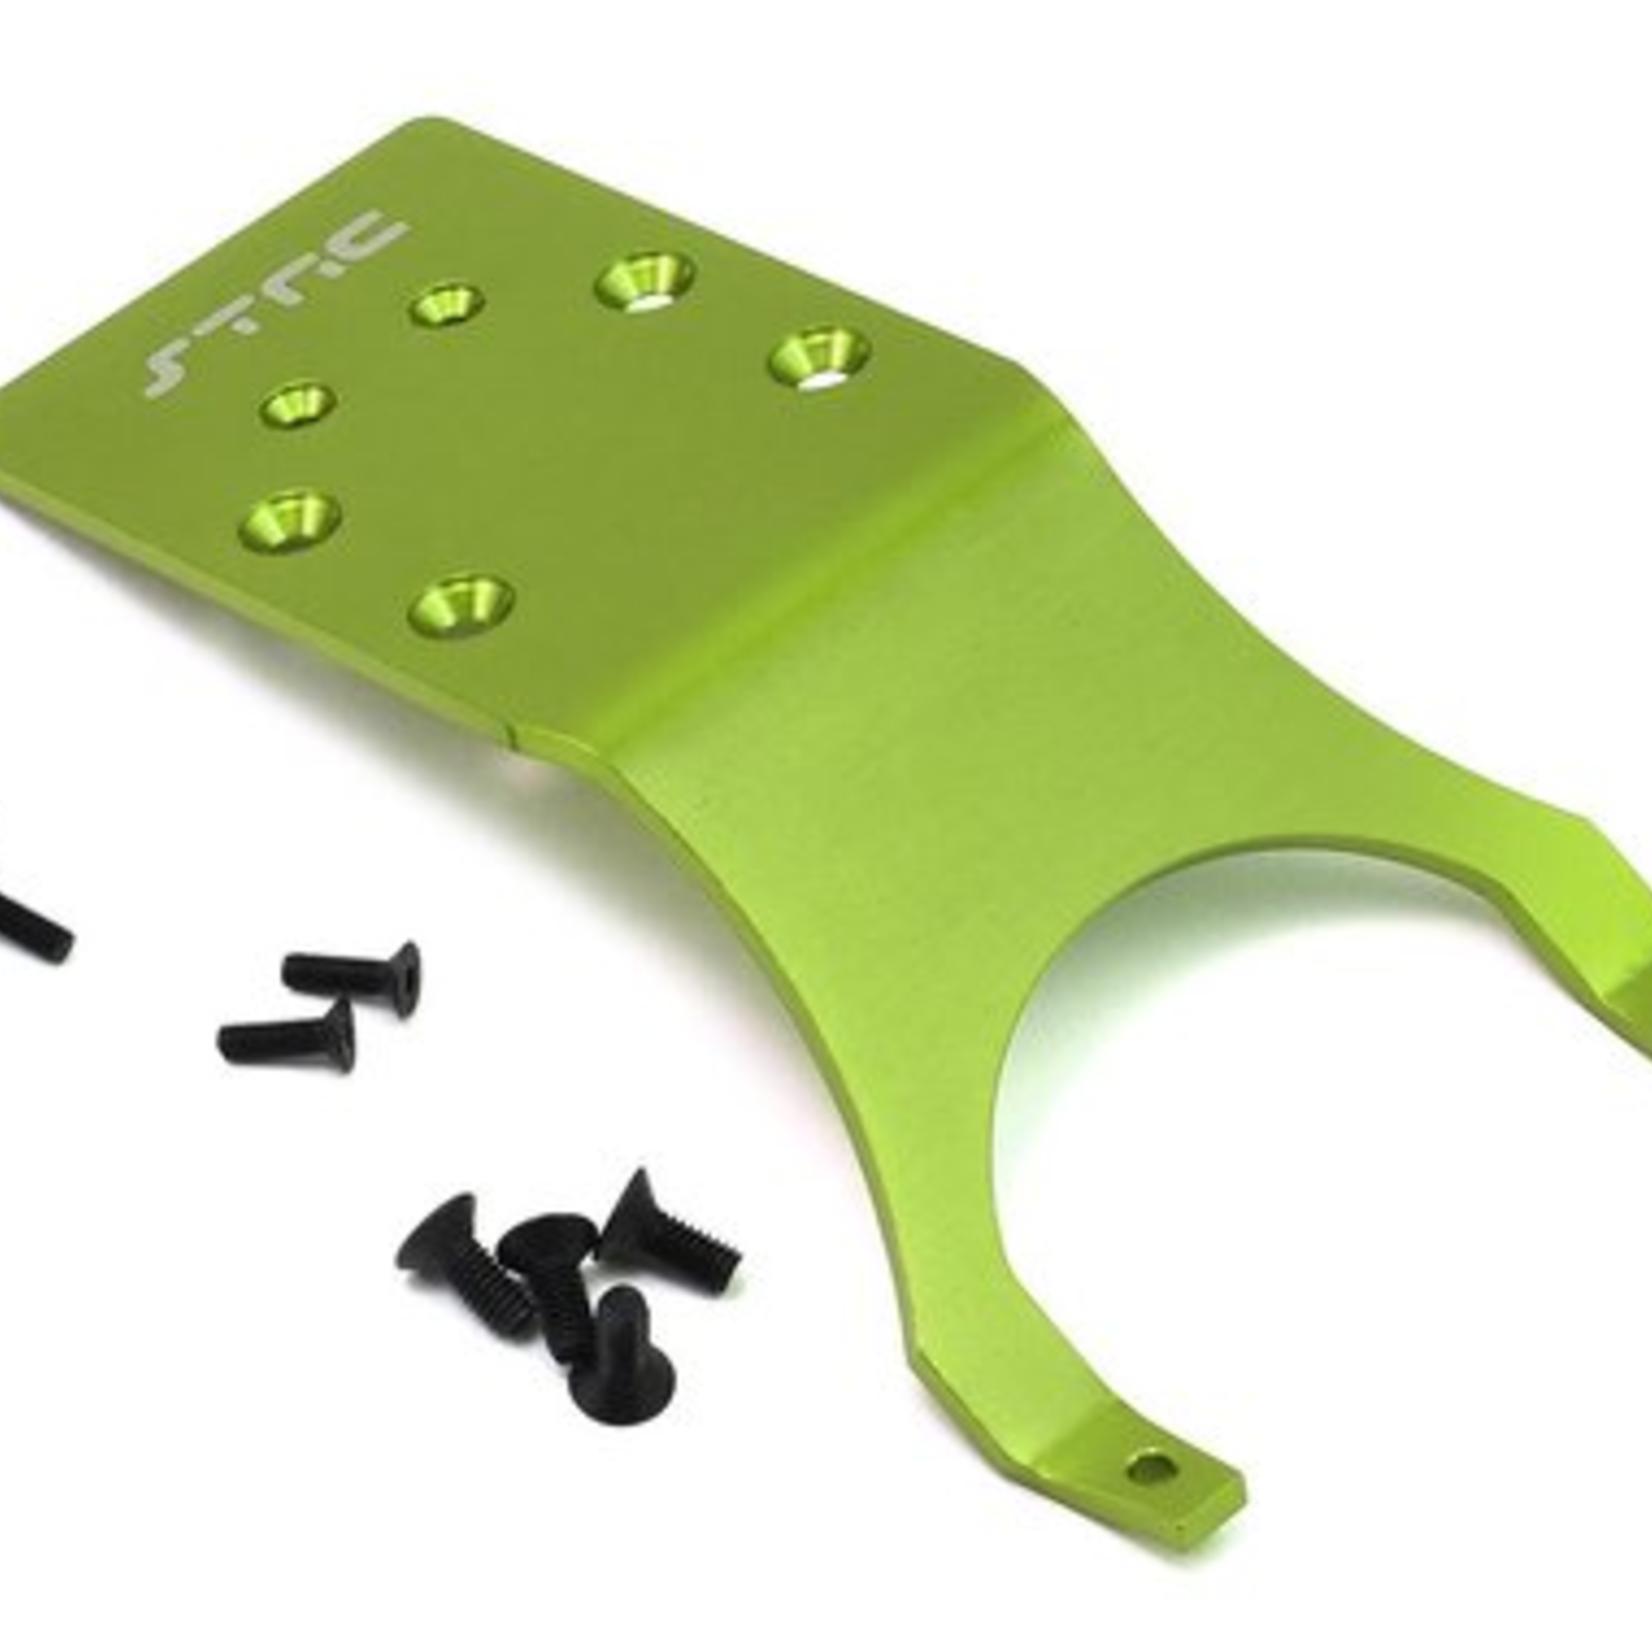 ST Racing Concepts SPTST3623RG ST Racing Concepts Stampede/Slash Aluminum Rear Skid Plate (Green)